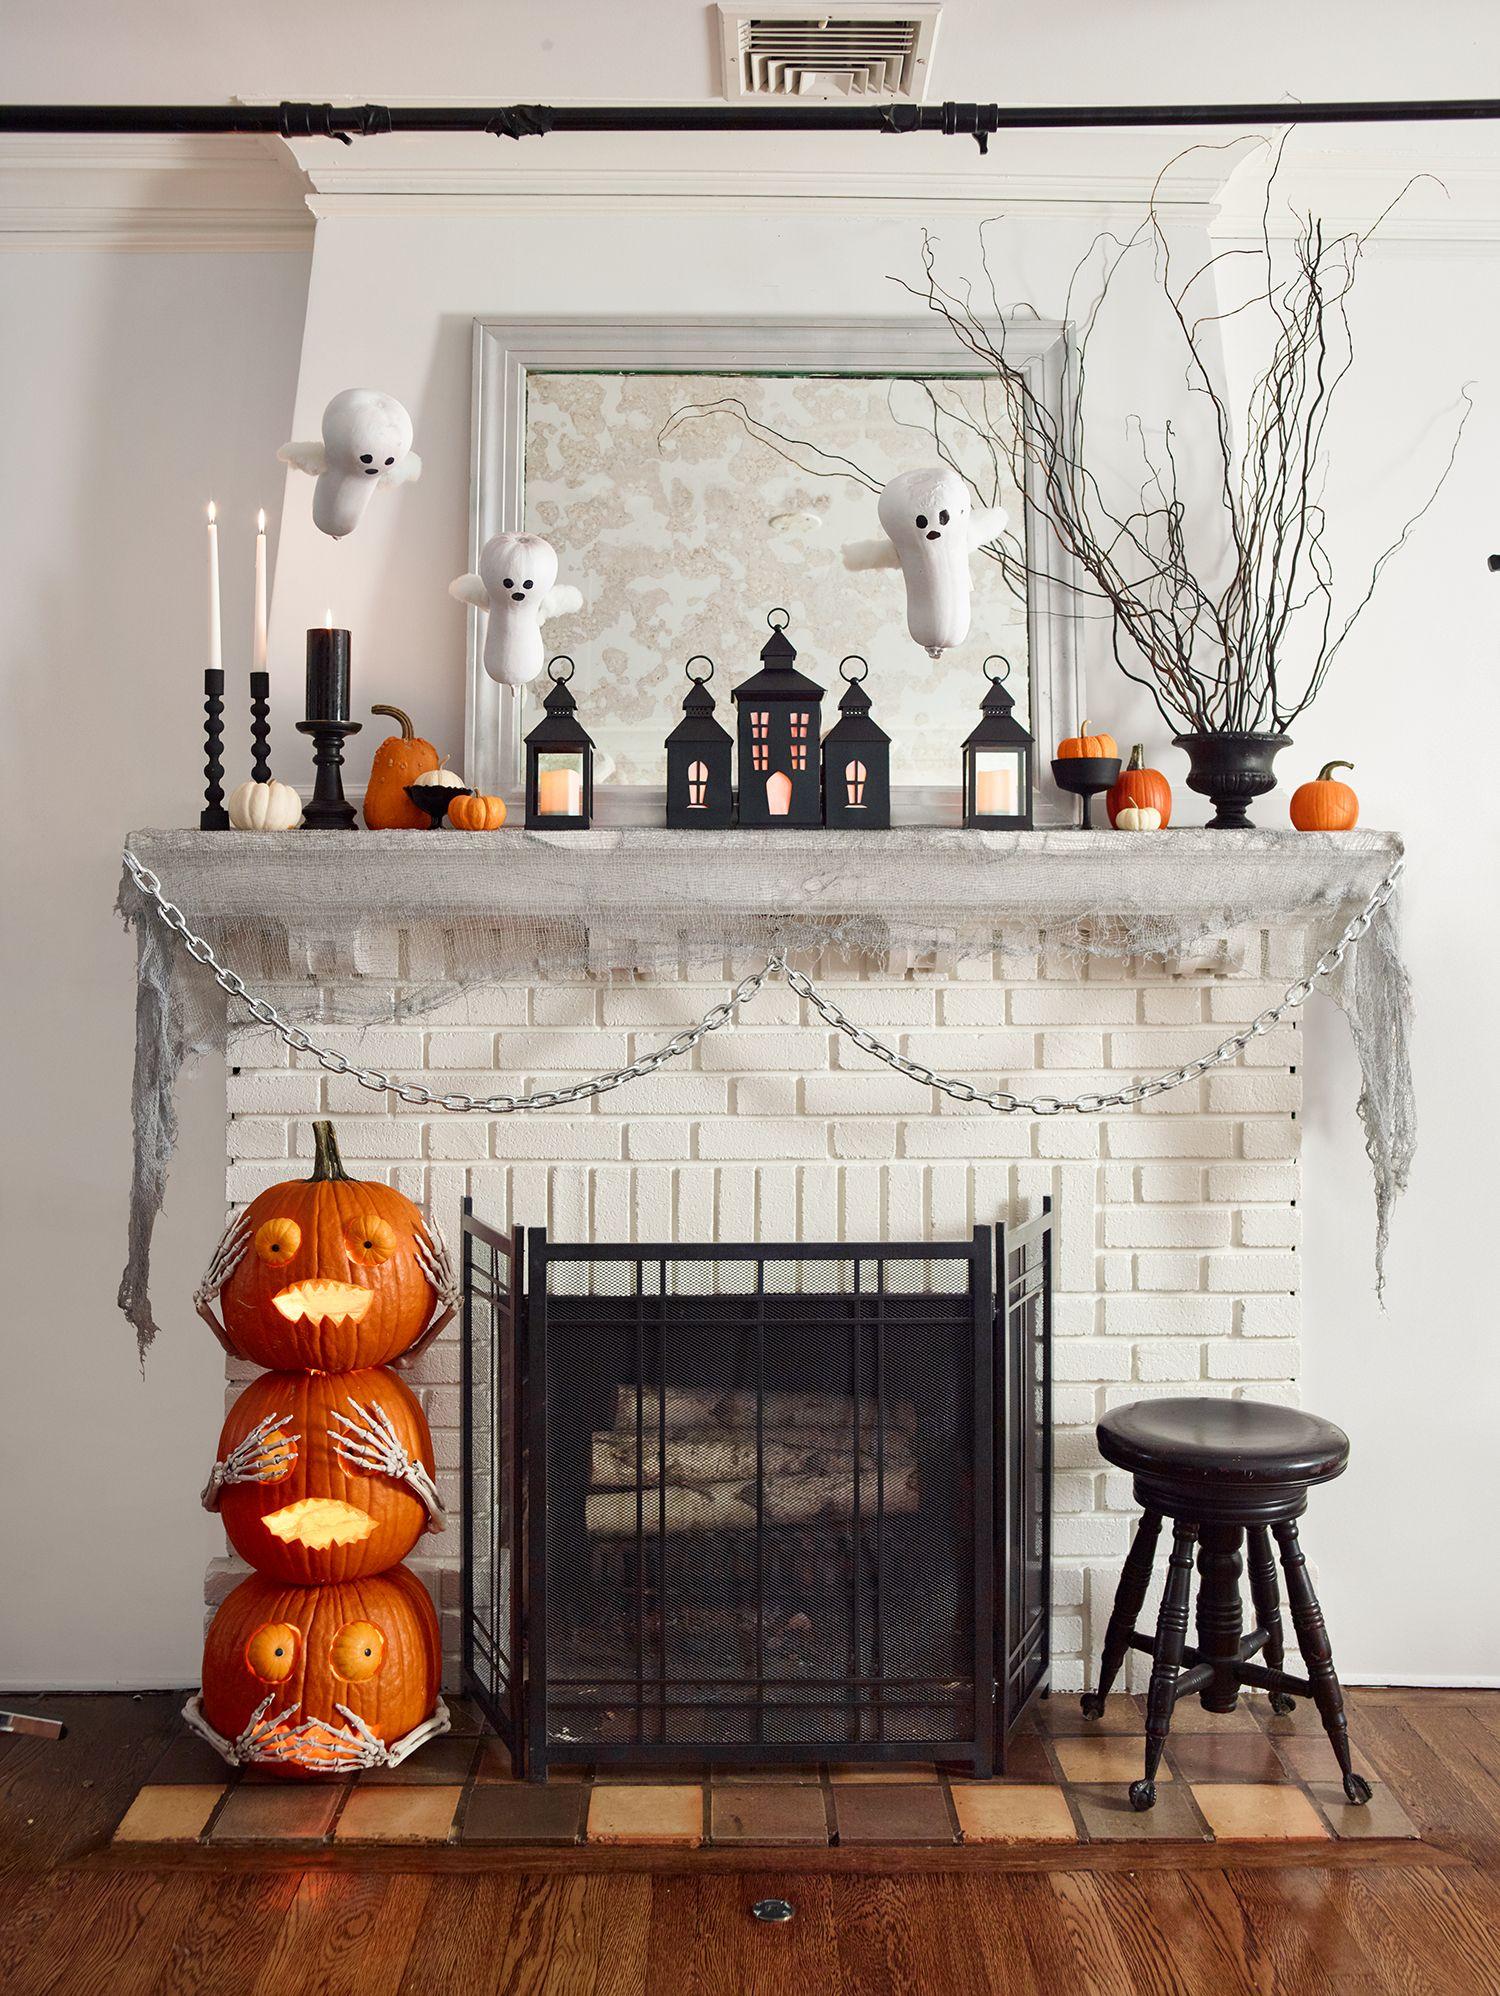 25 Stylish Fall Mantel Decor Ideas Best Autumn Mantel Decorations